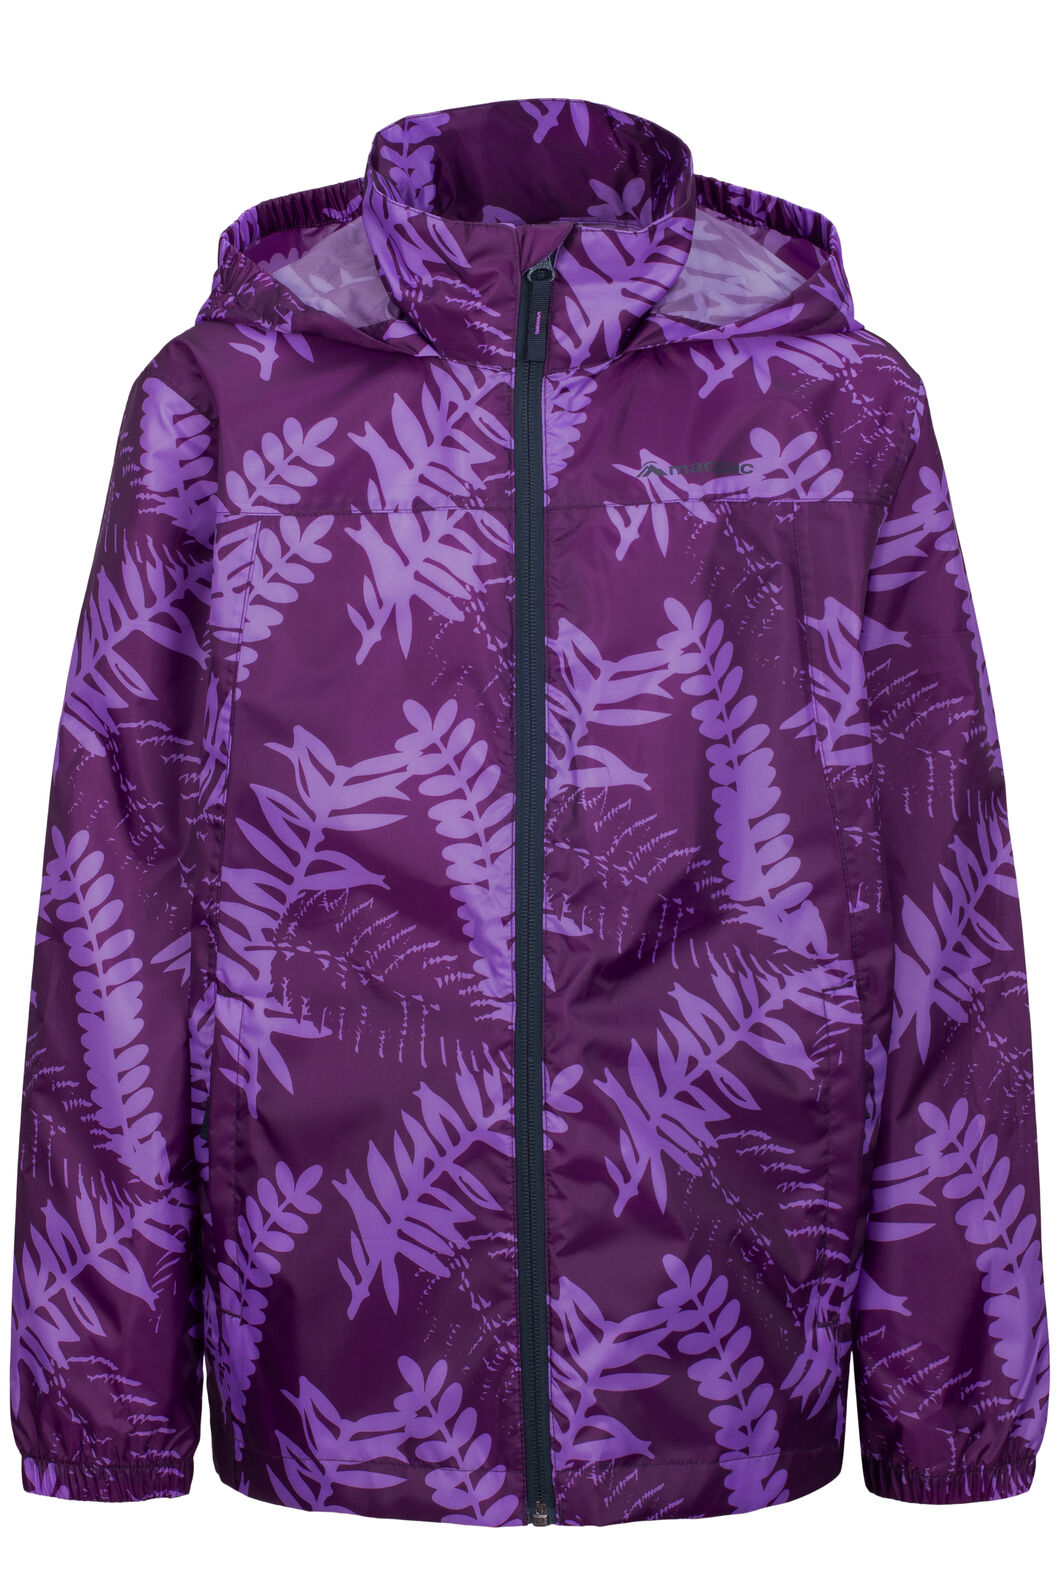 Macpac Pack-It-Jacket — Kids', Amaranth Print, hi-res